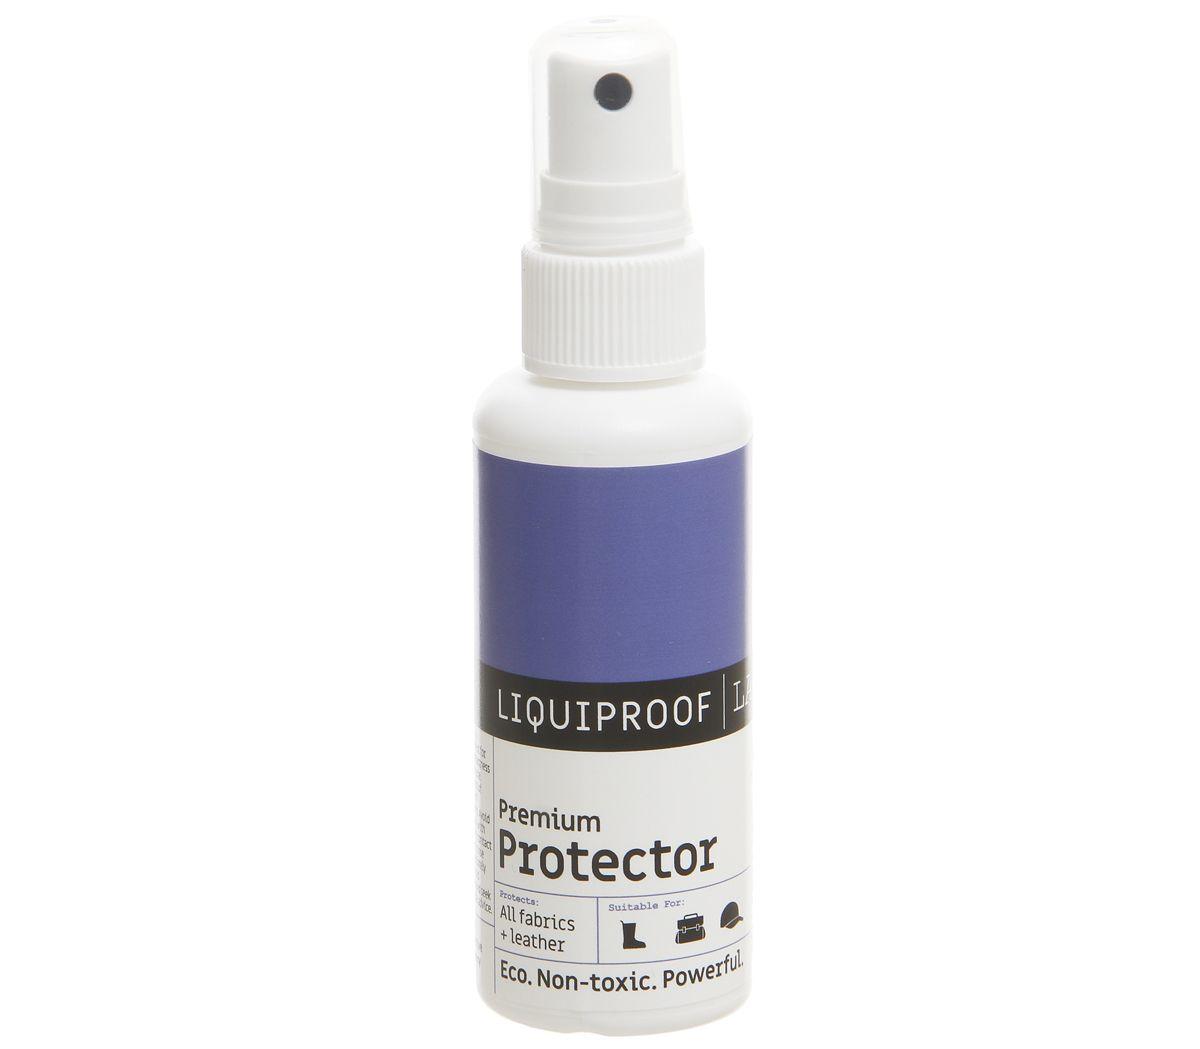 Liquiproof Premium Protector Spray 50ml